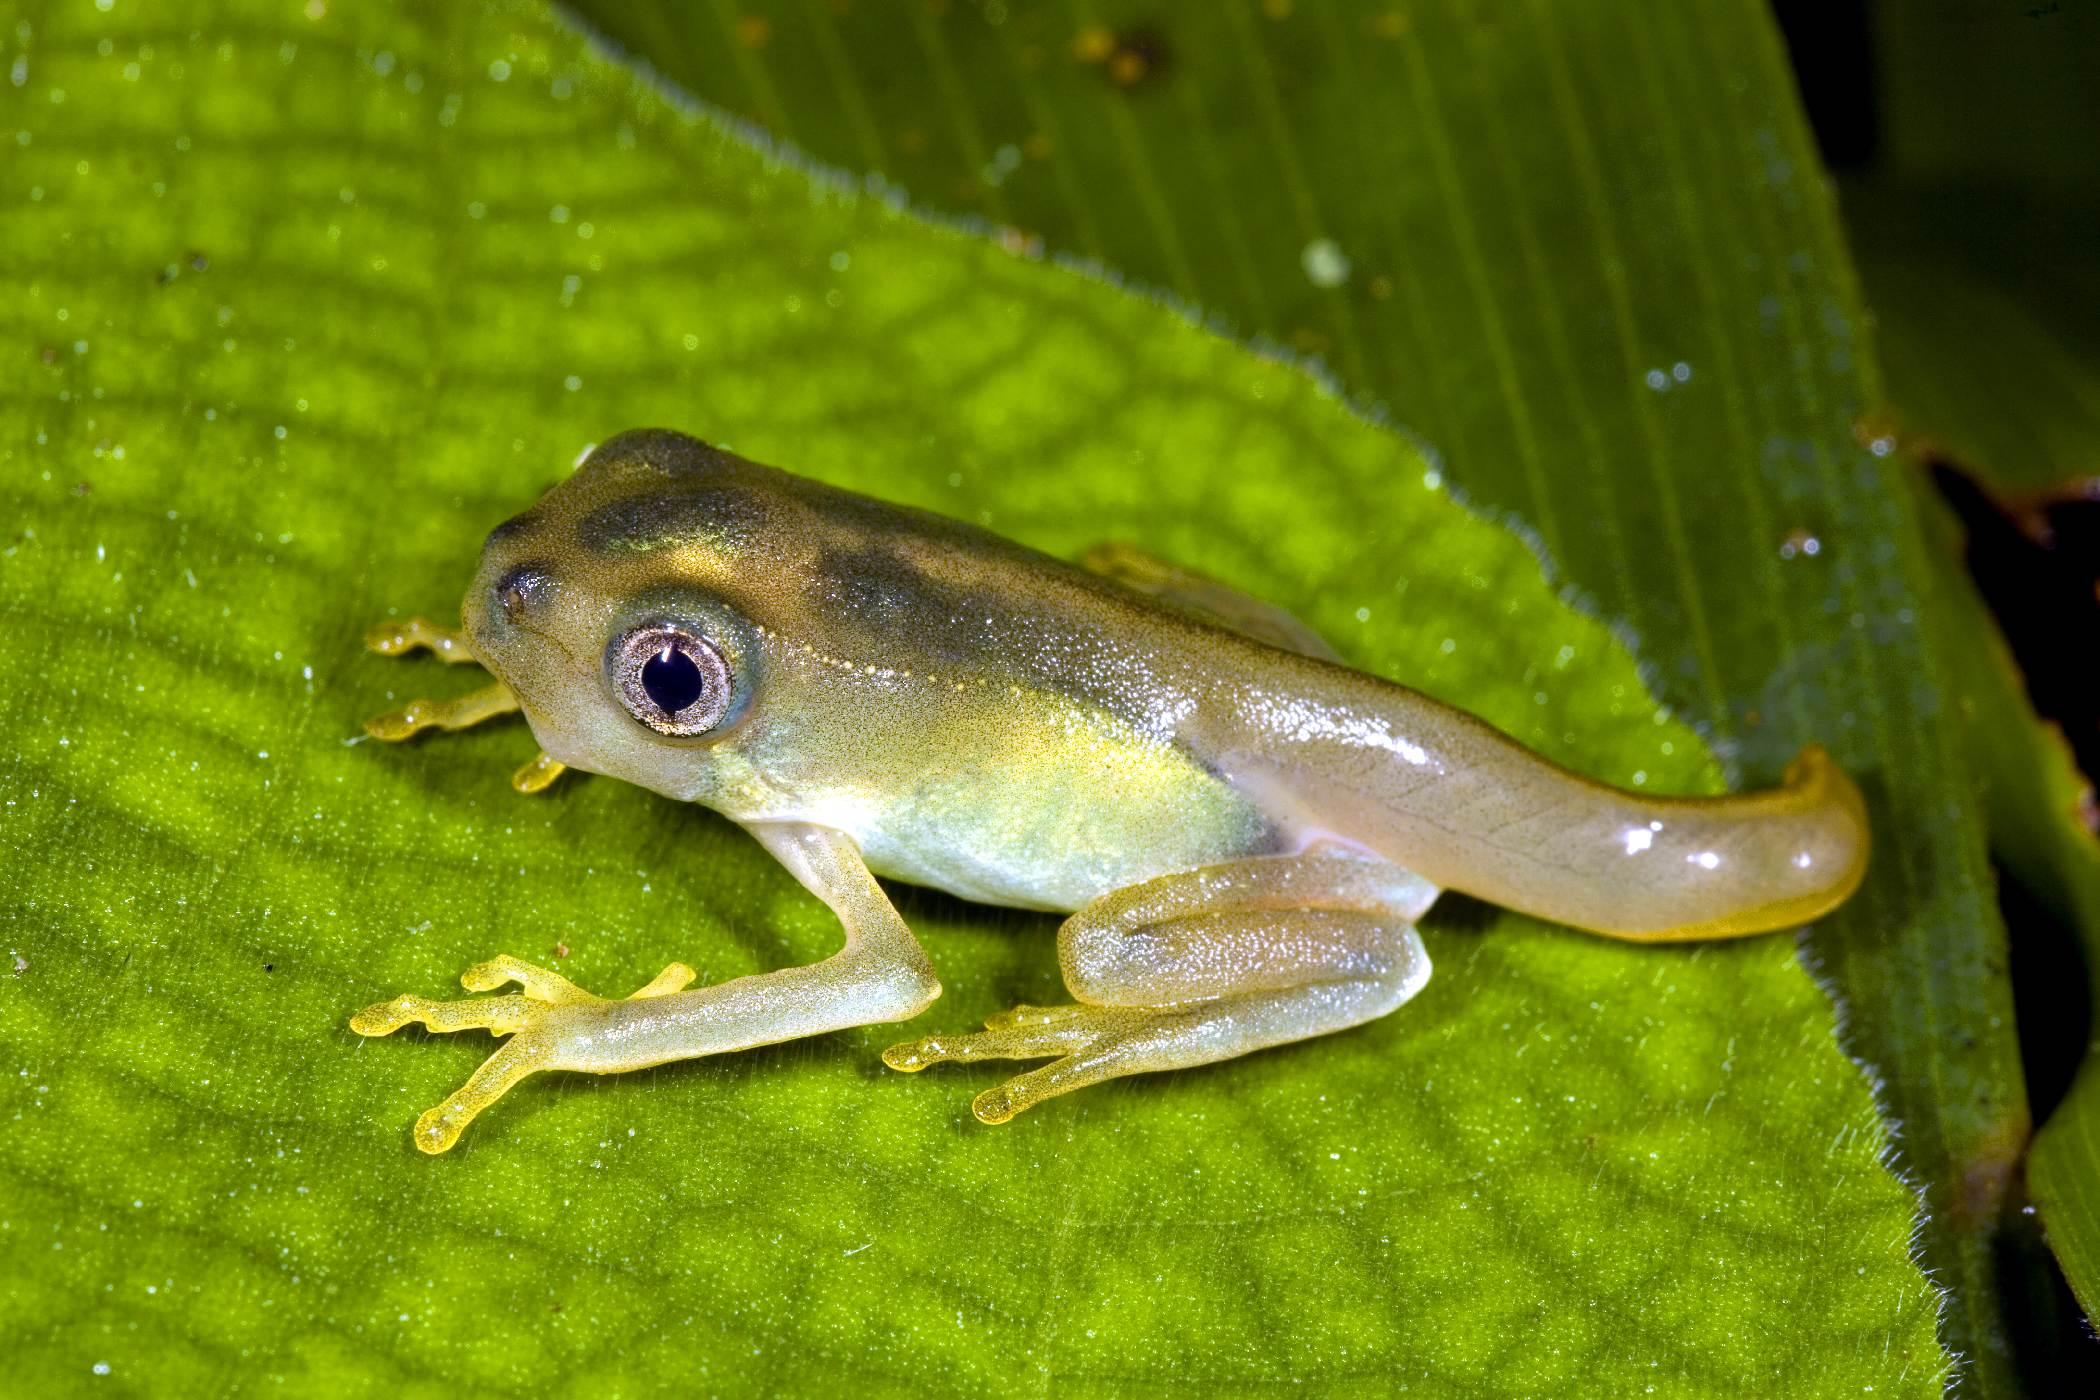 Helping tadpoles grow up into gardeners friends